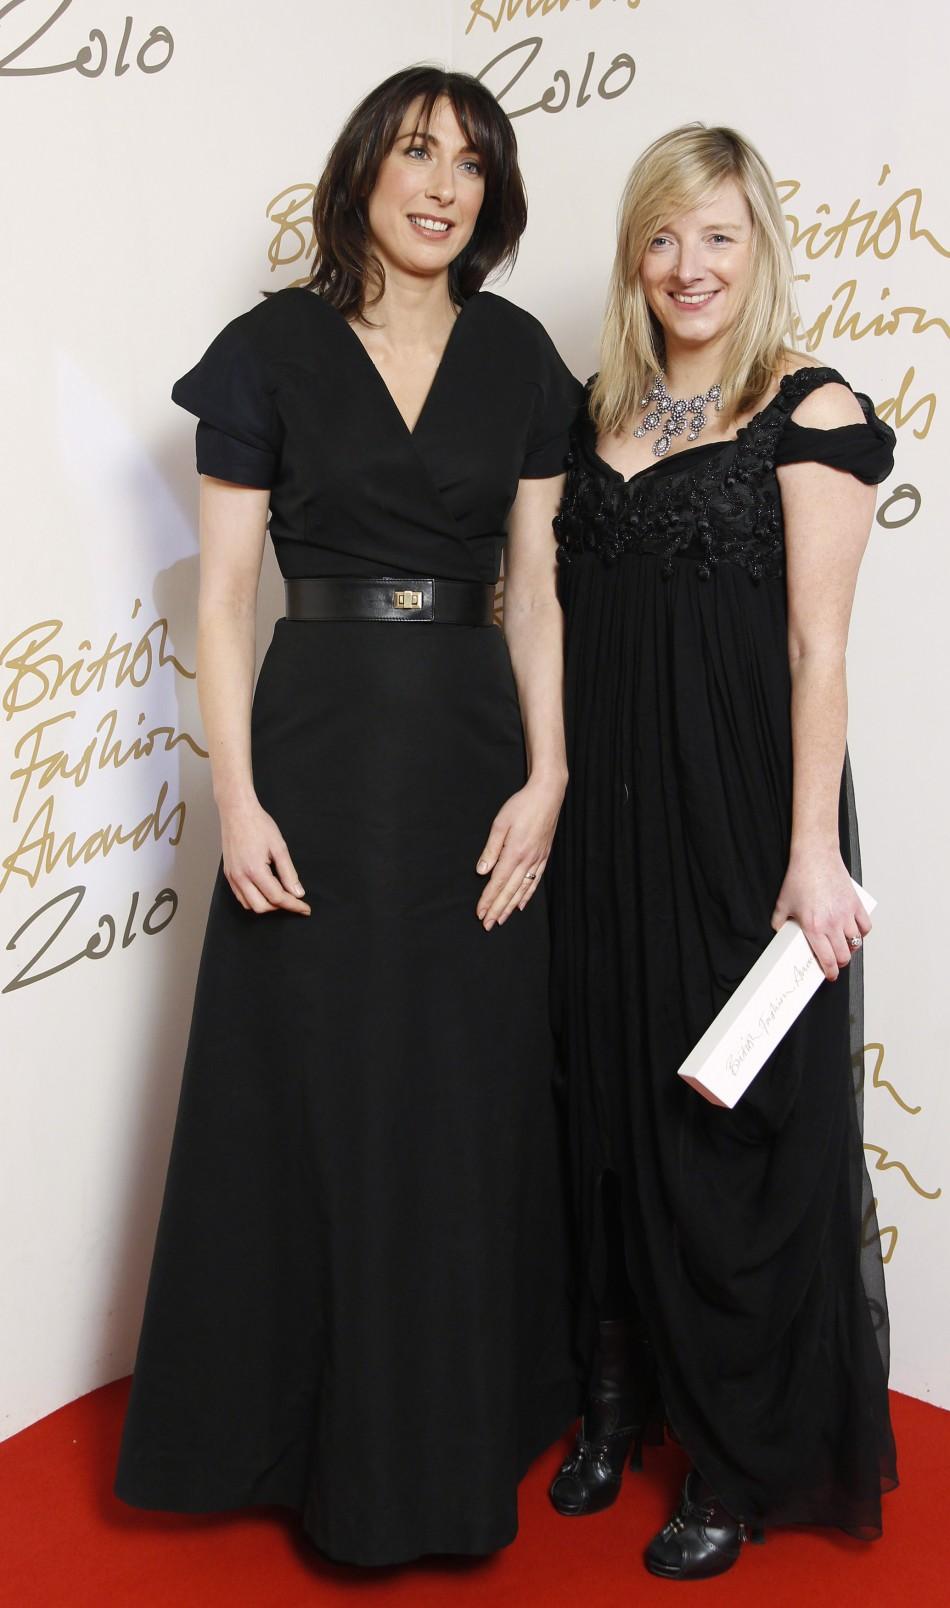 British Fashion Awards 2011: Designer of the year - Sarah Burton for Alexander McQueen